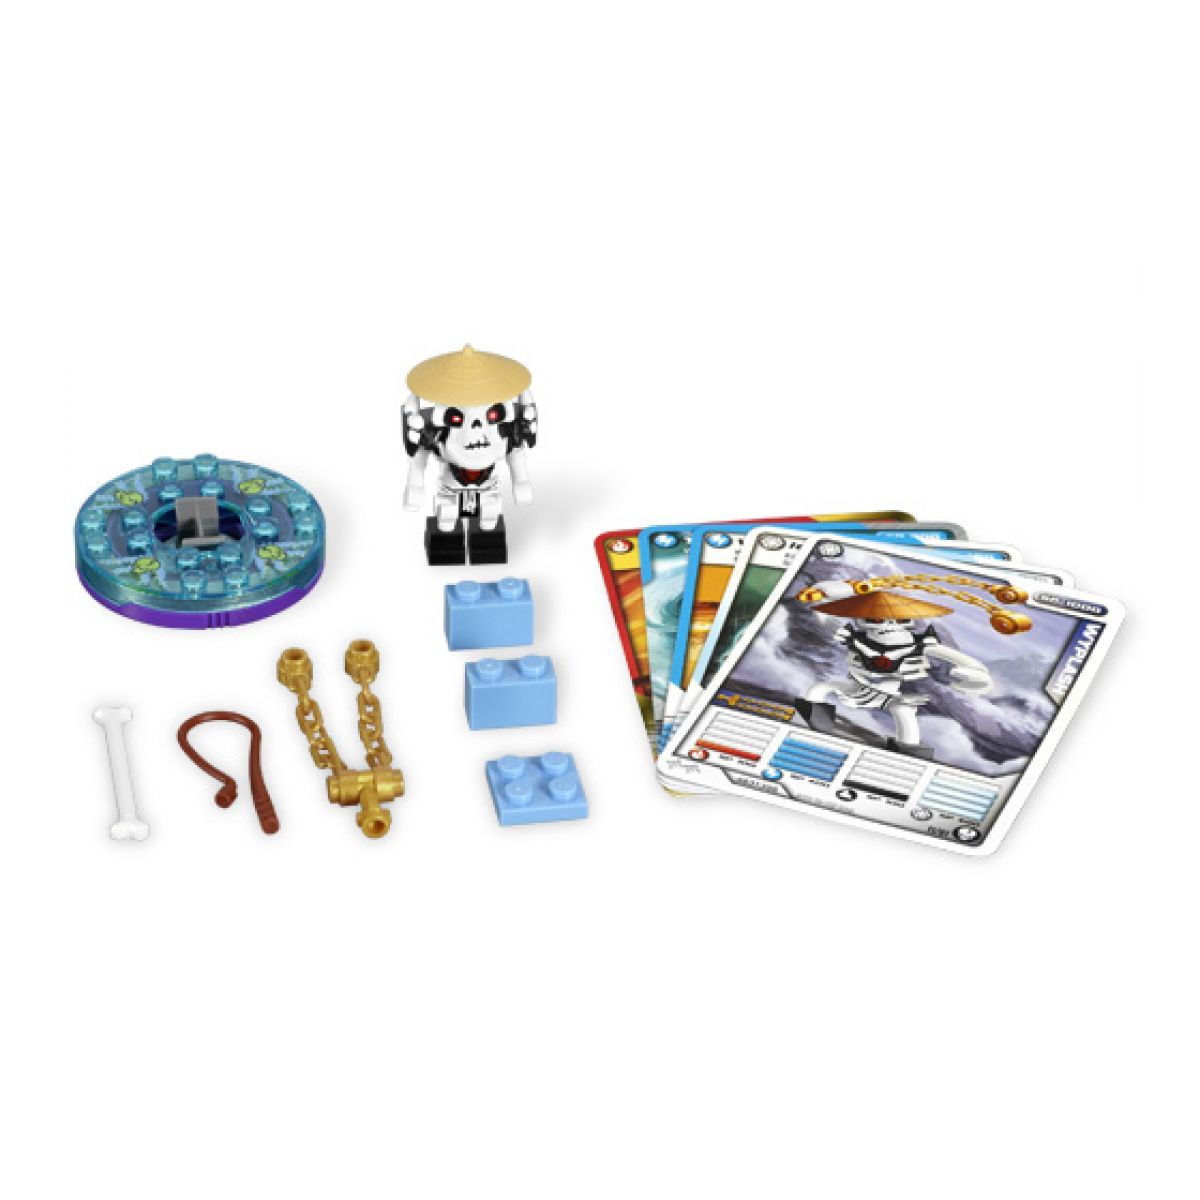 LEGO Ninjago 2175 Wyplash